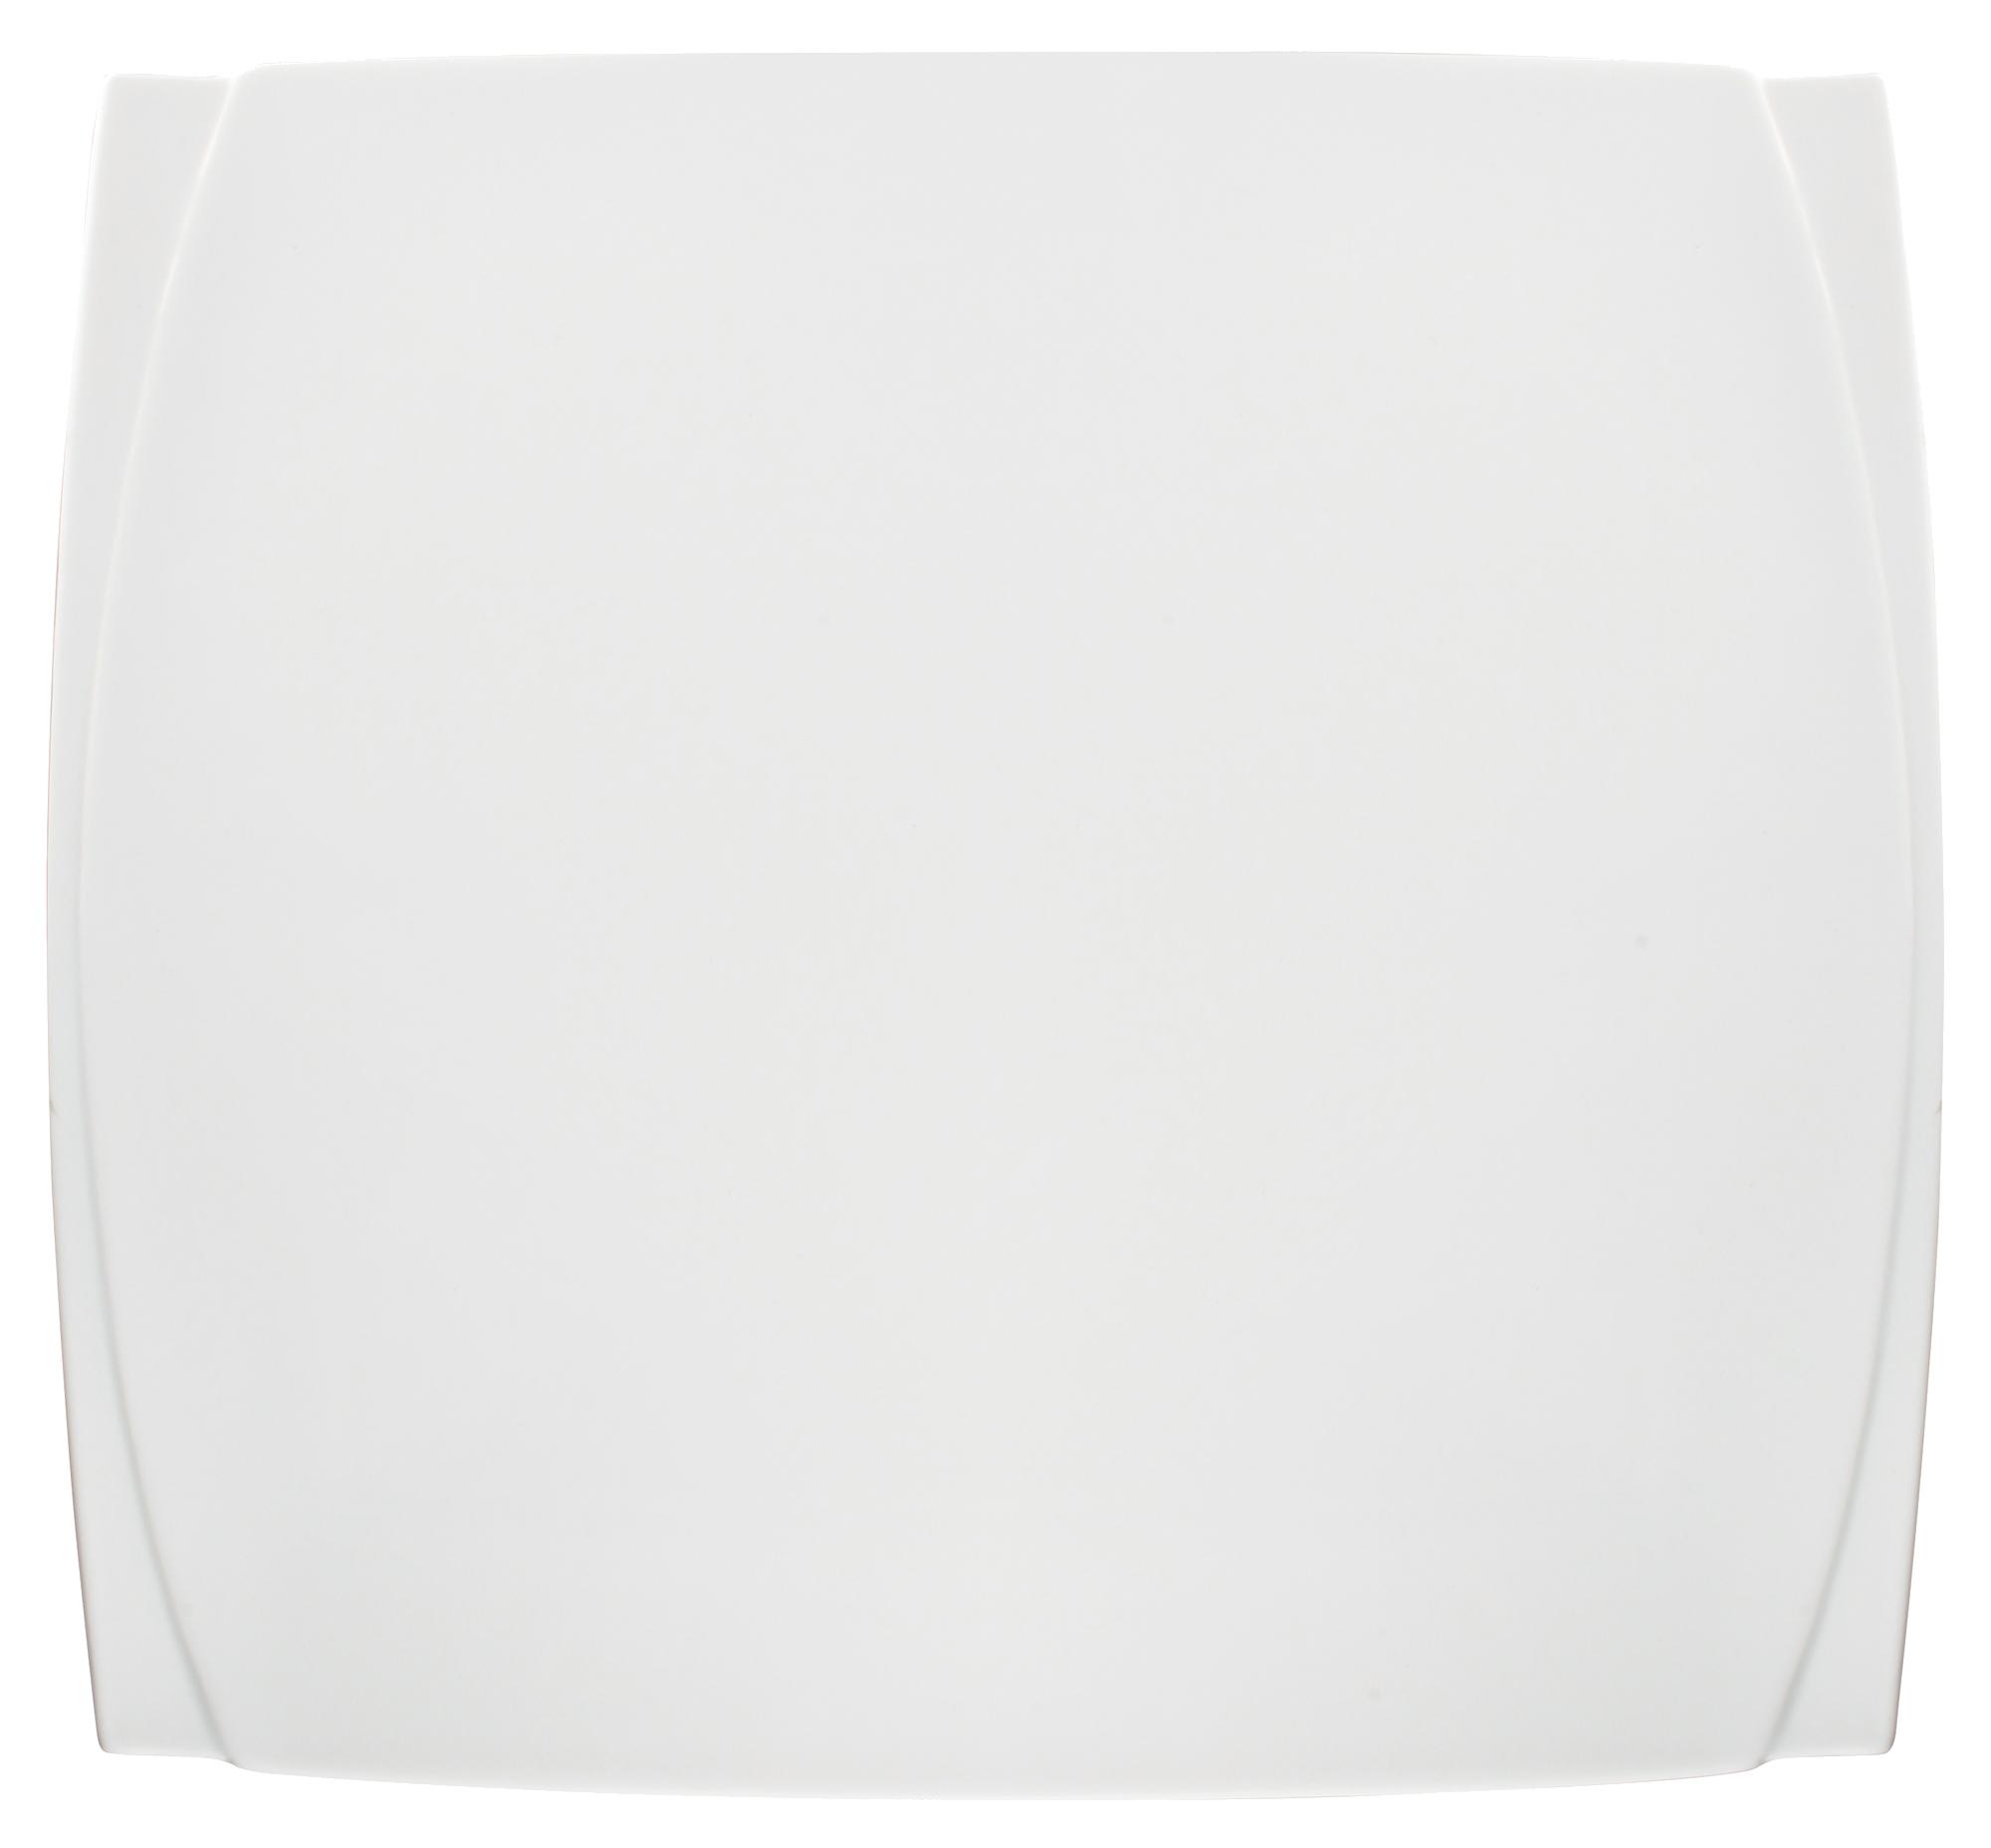 Winco WDP009-103 plate, china